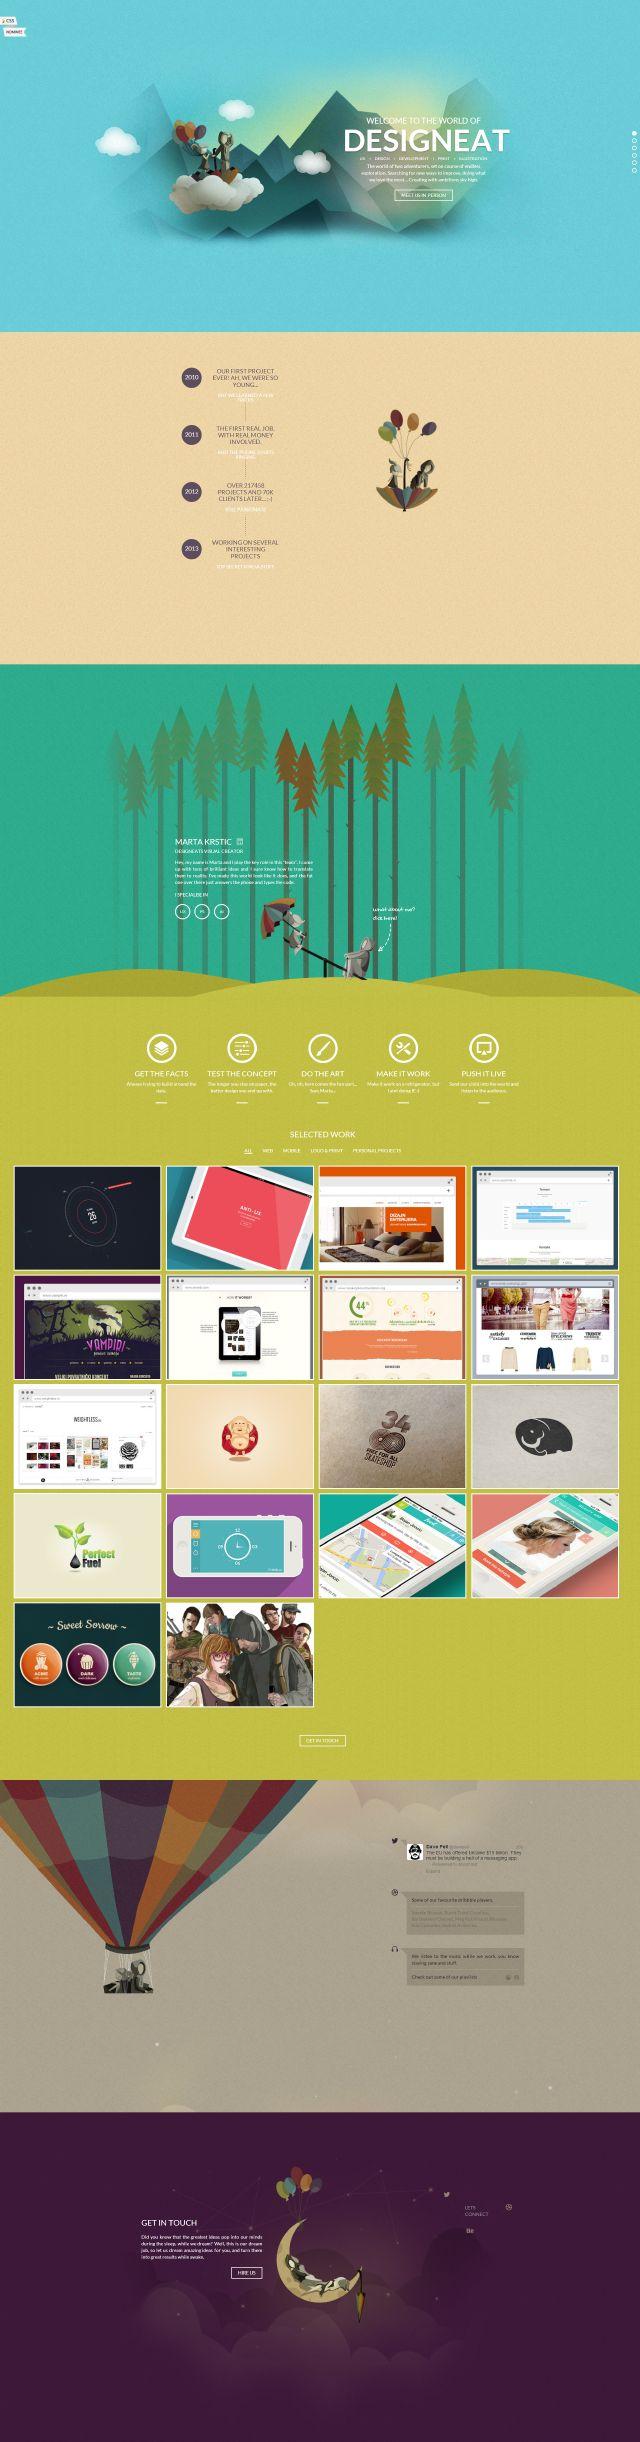 http://www.designeat.com/